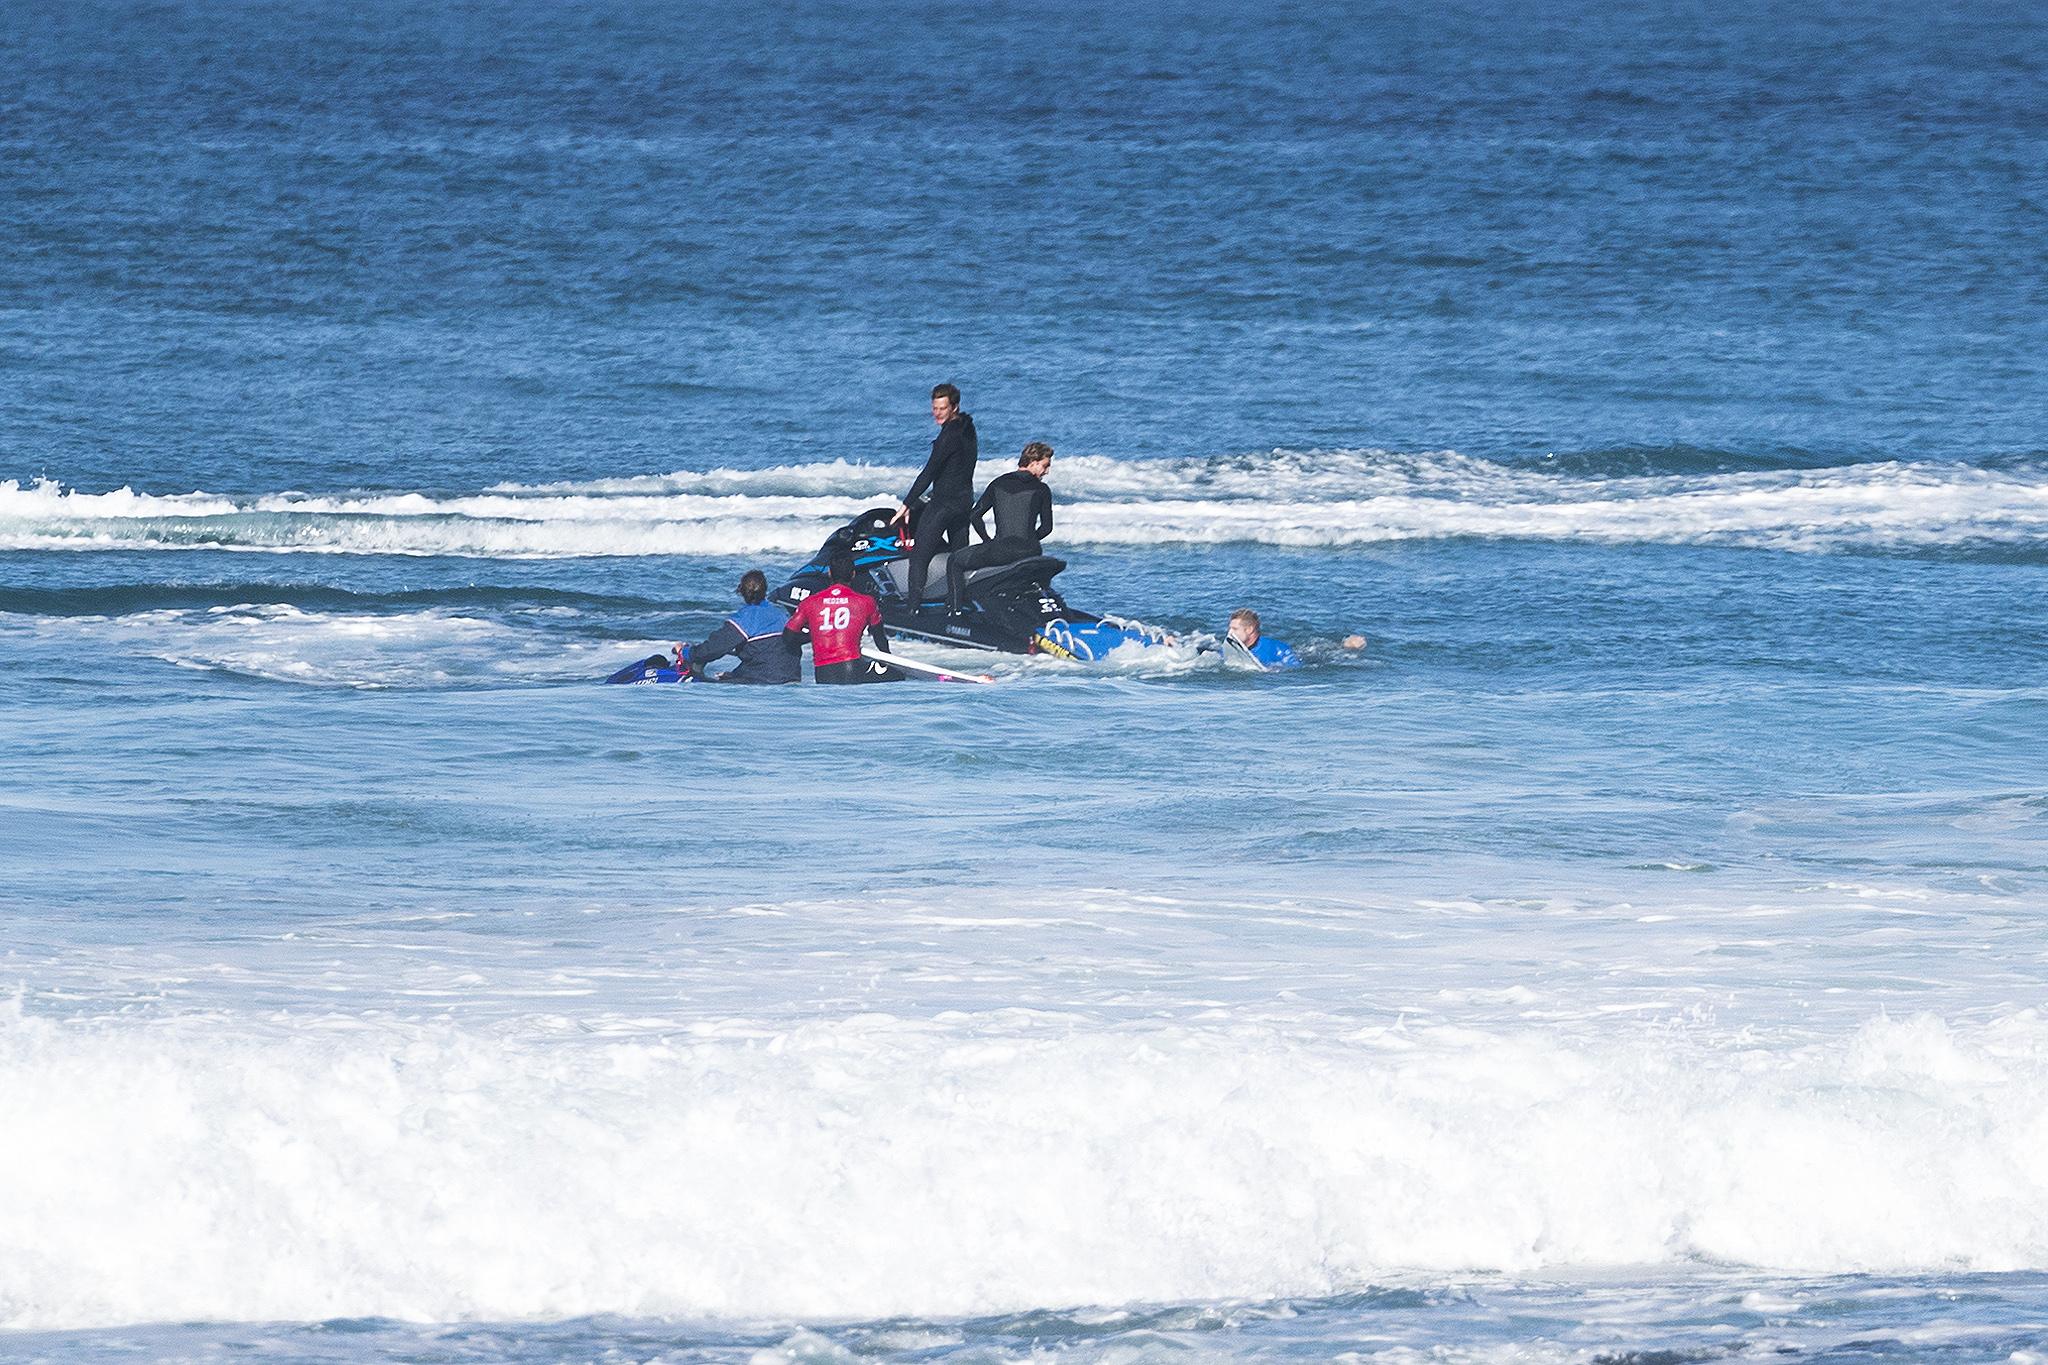 Retirada dos surfistas (@WSL / Pierre Tostee)